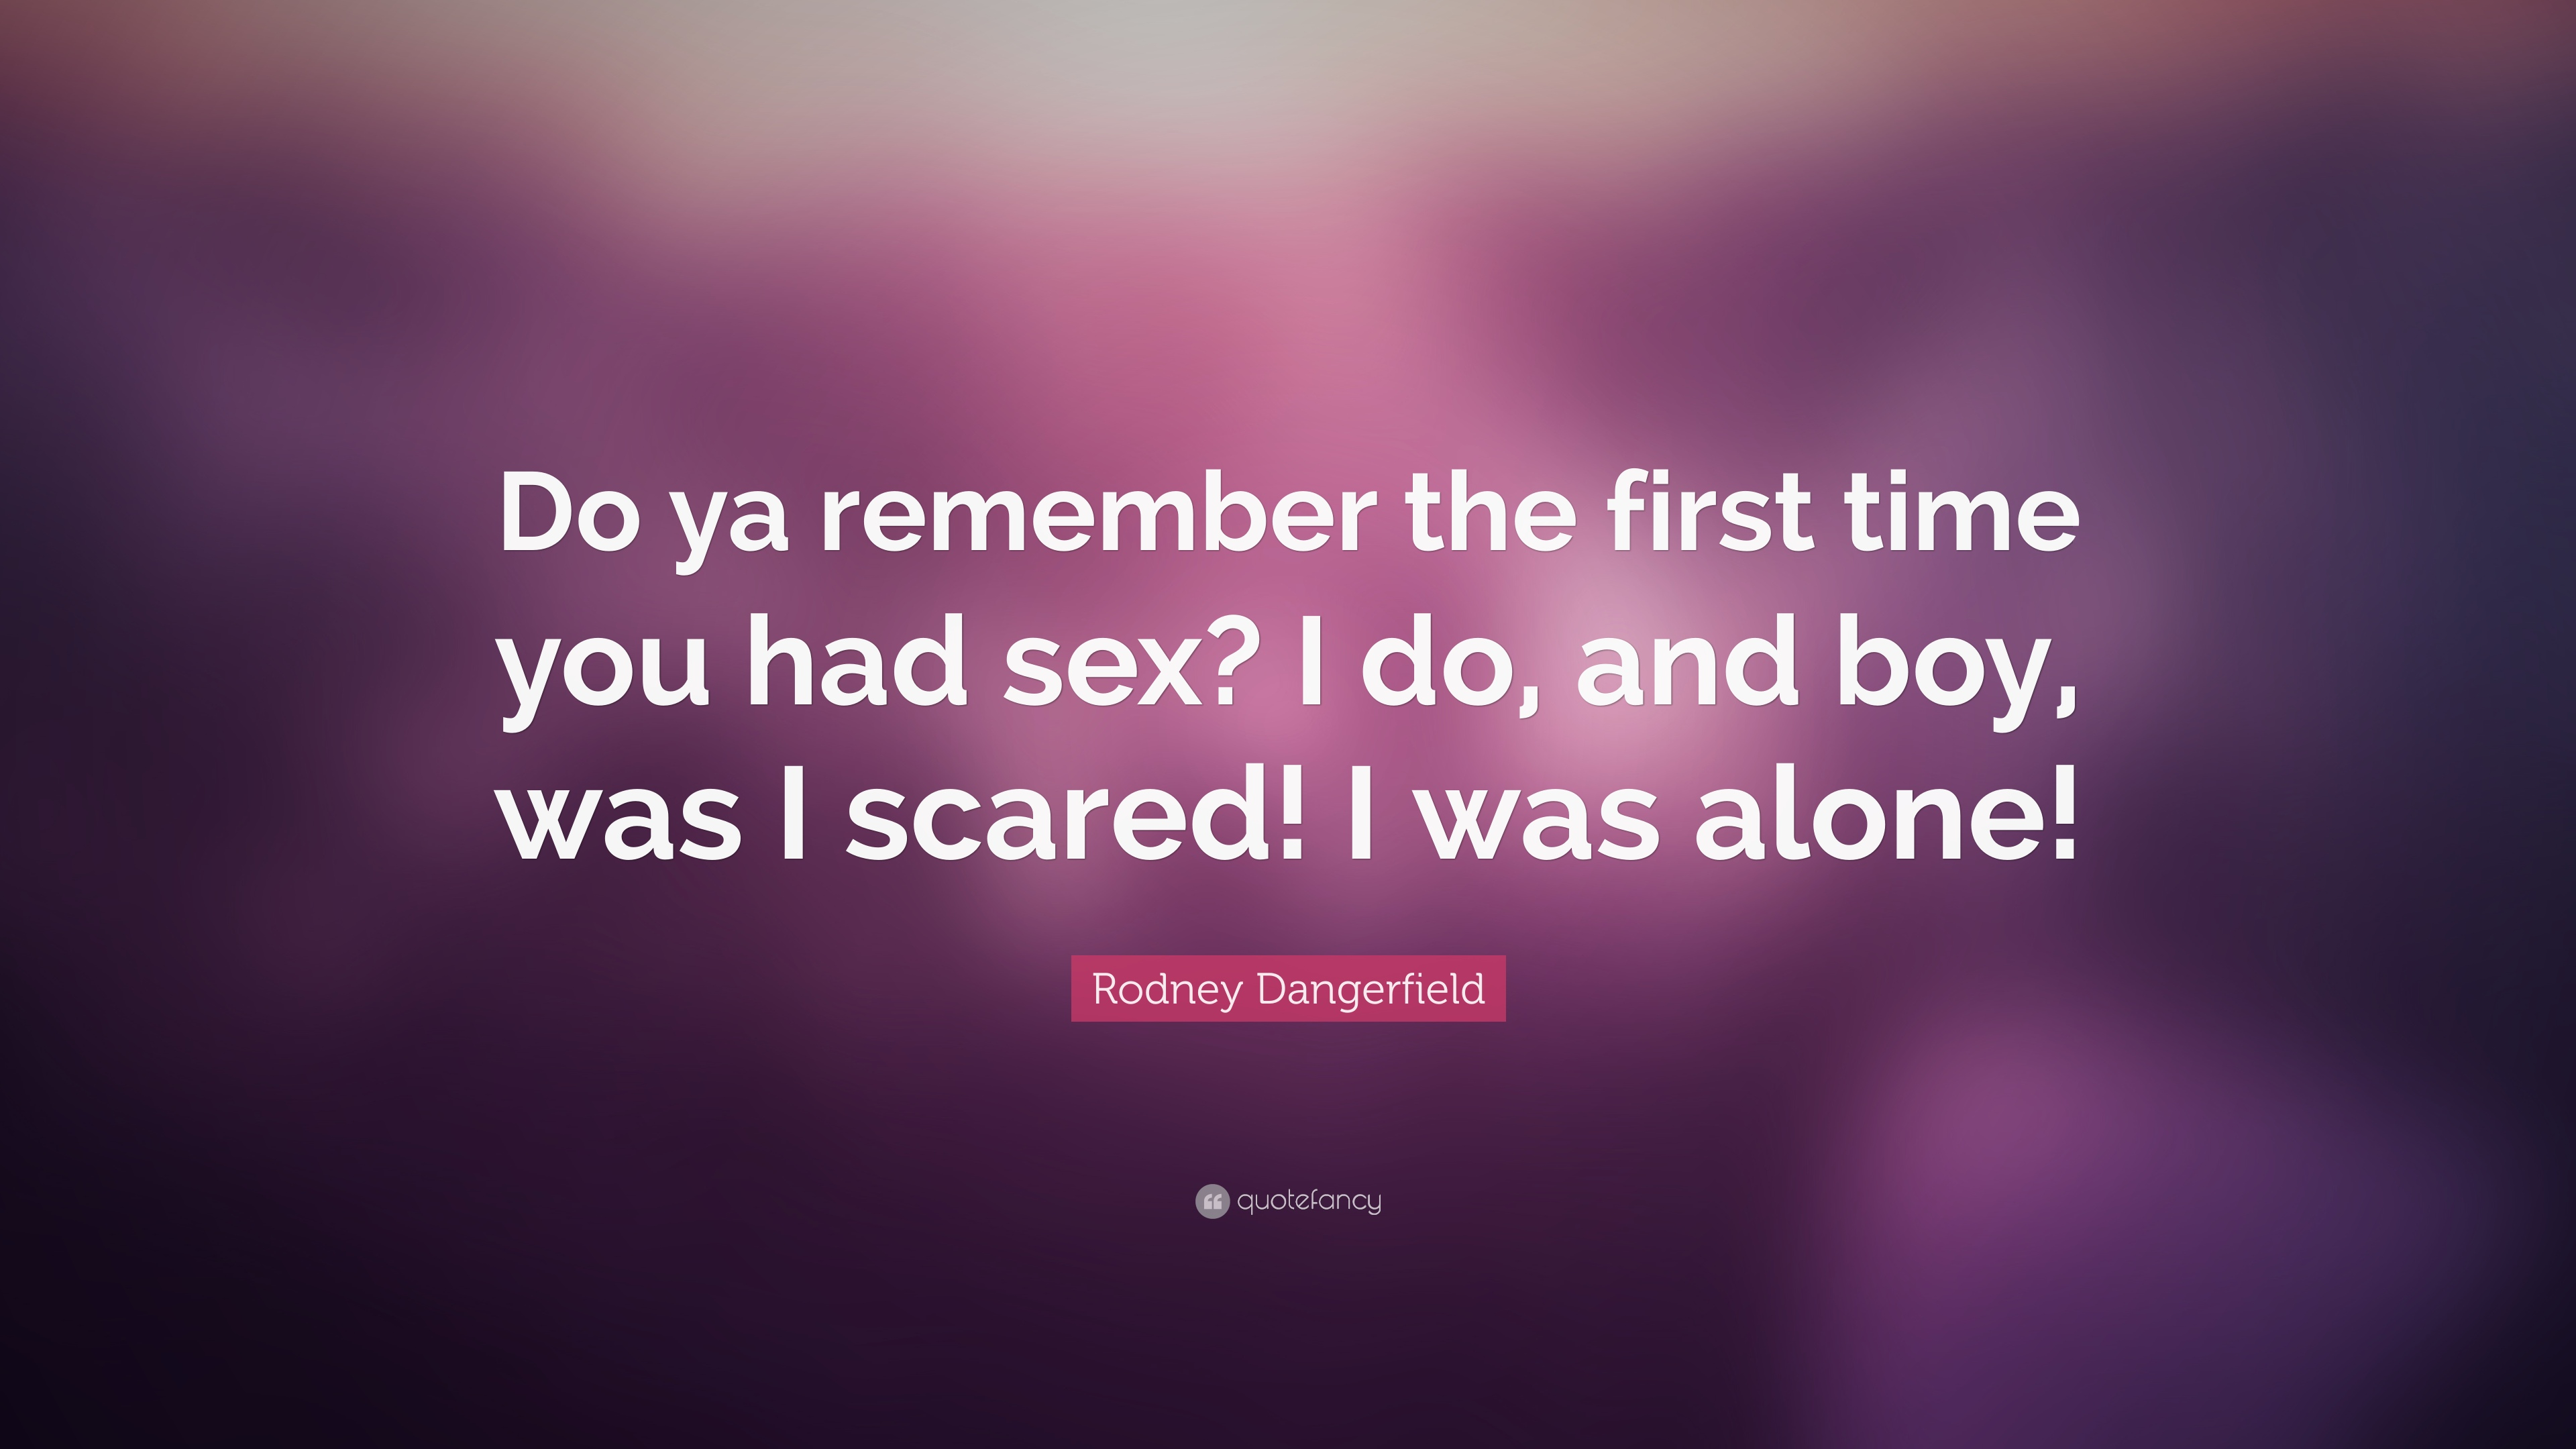 First time u had sex